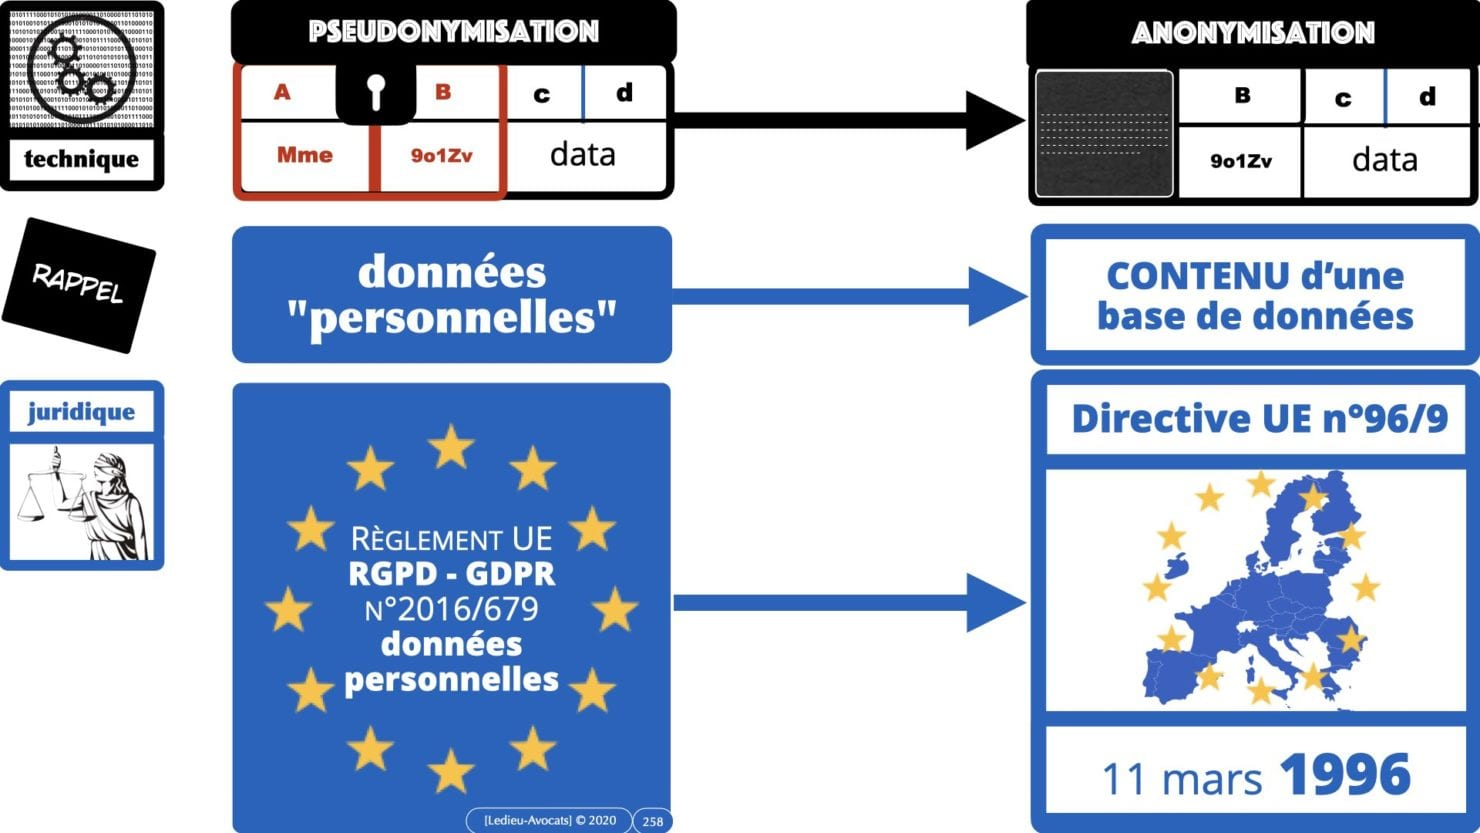 RGPD e-Privacy principes actualité jurisprudence ©Ledieu-Avocats 25-06-2021.258